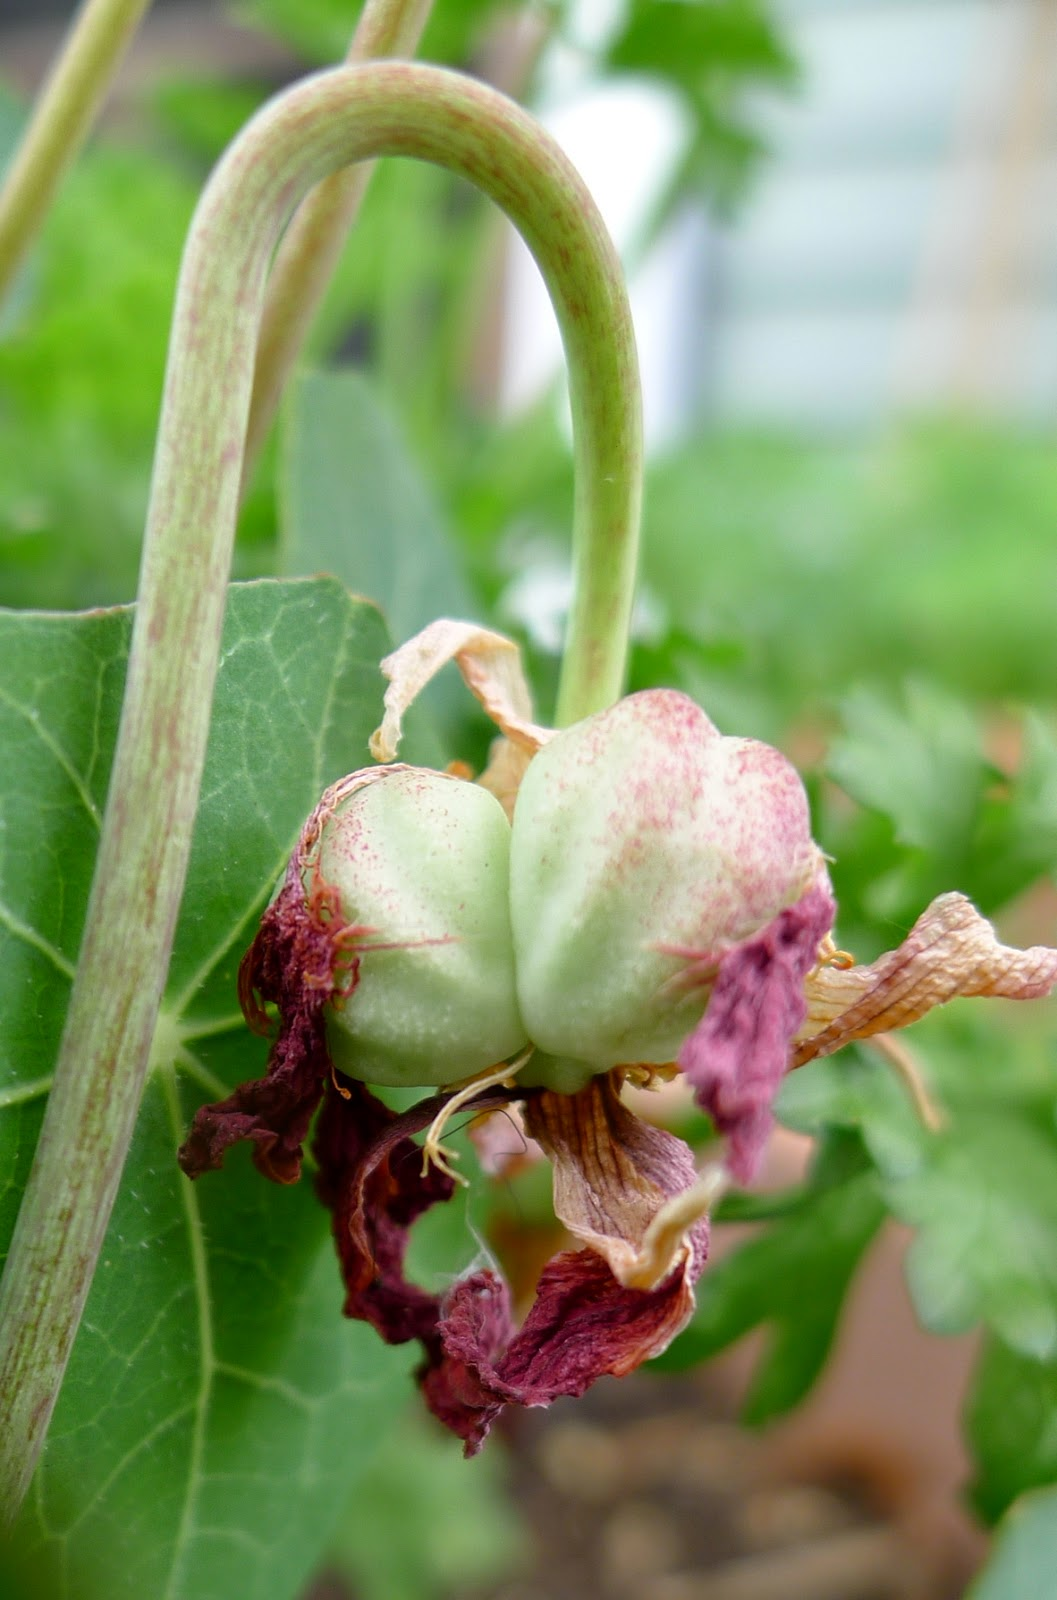 nasturtium seeds, nasturtium capers, edible flowers